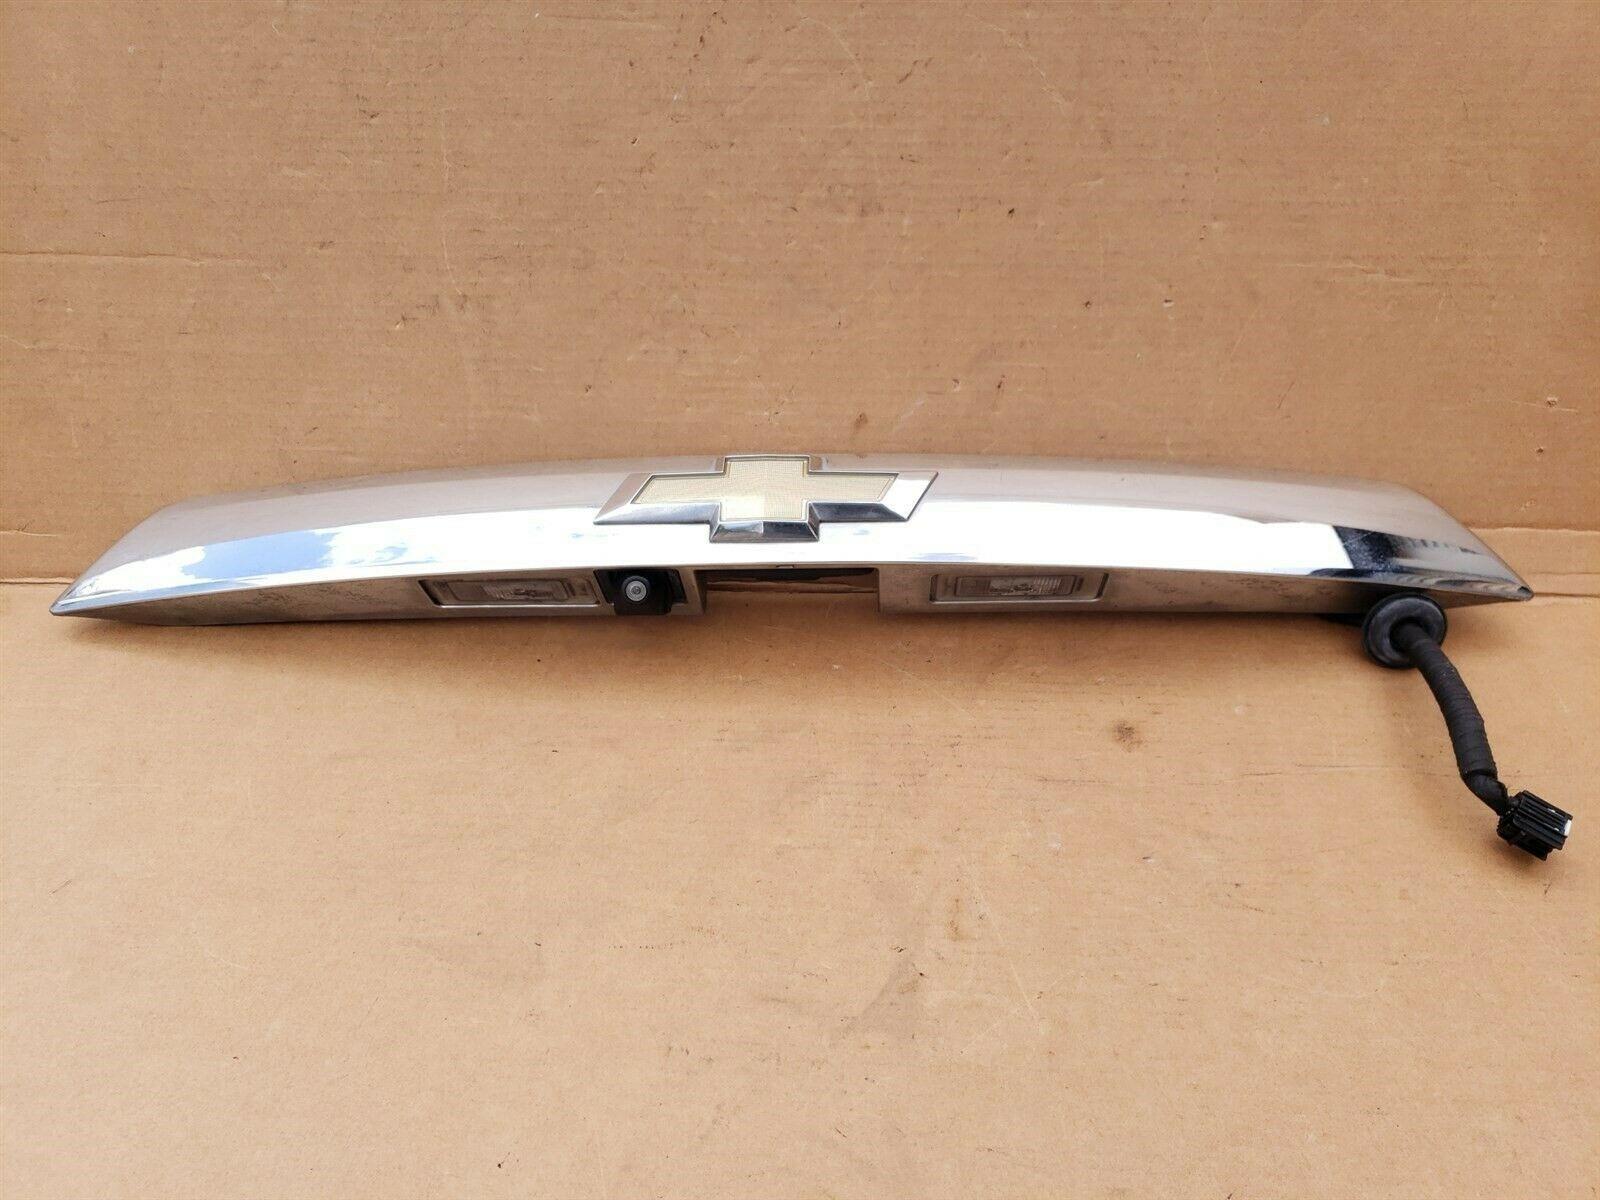 10-13 Chevy Equinox Trunk Liftgate Applique Rear Finish Panel Trim w Camera